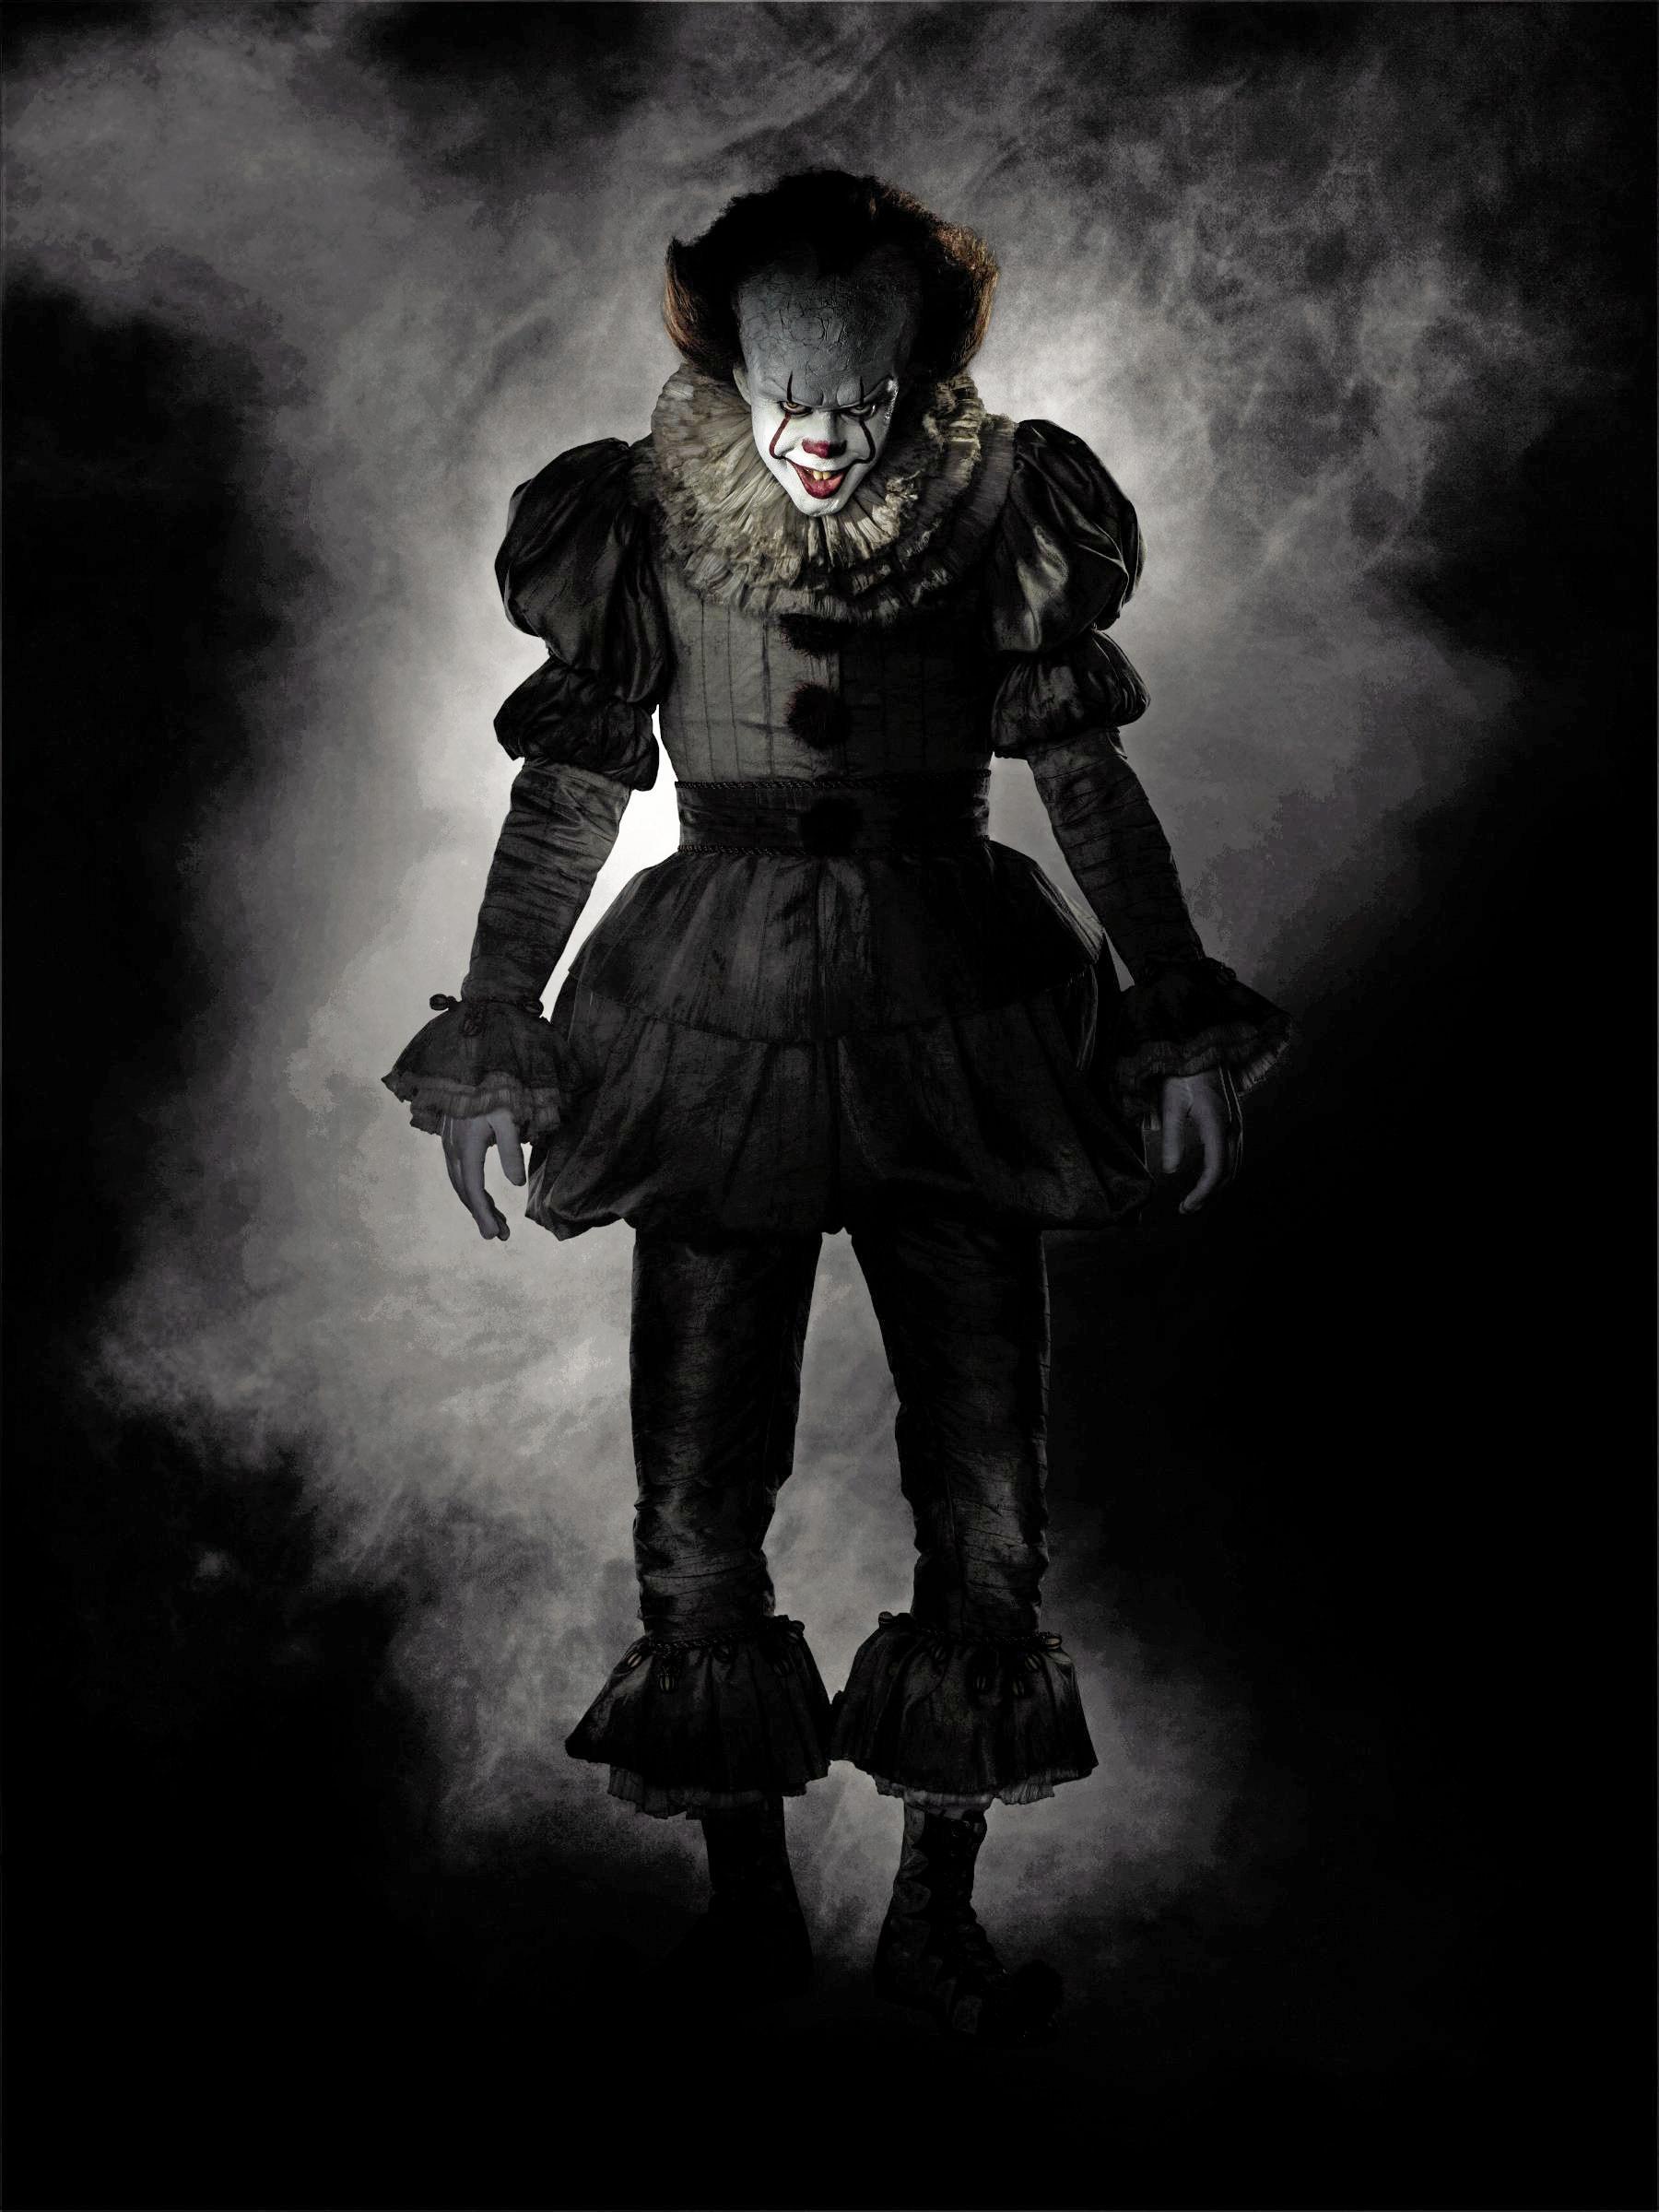 NIGHTMARE FUEL: Pennywise the clown (Bill Skarsgard) is a scene stealer in Stephen King's It.